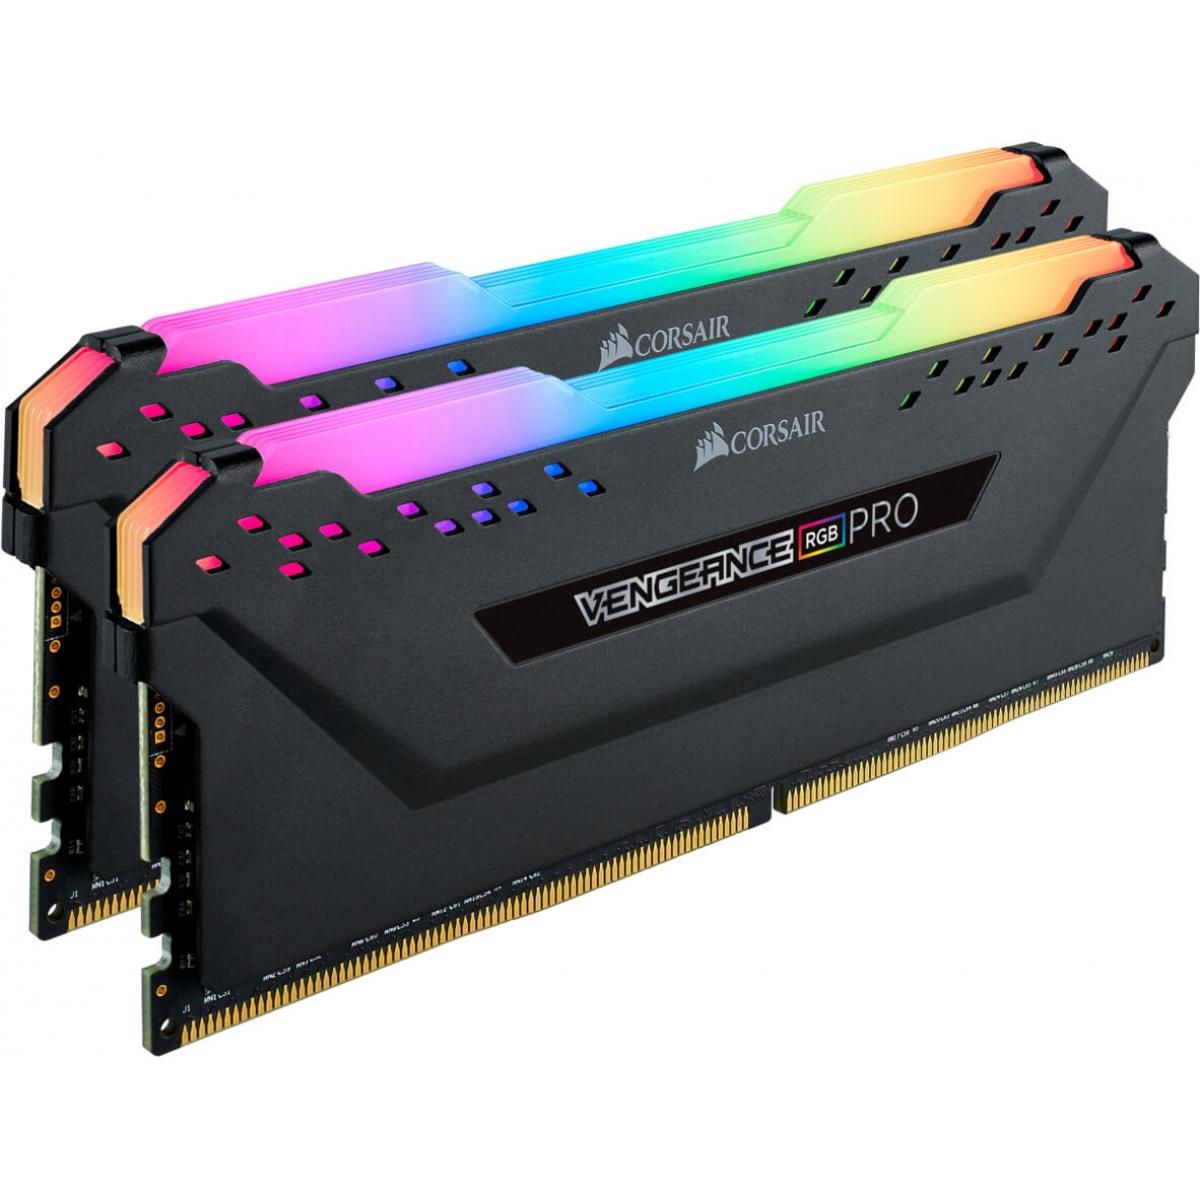 Memória DDR4 Corsair Vengeance RGB Pro CMW32GX4M2C3000C15 32GB (2x16GB) 3000MHz